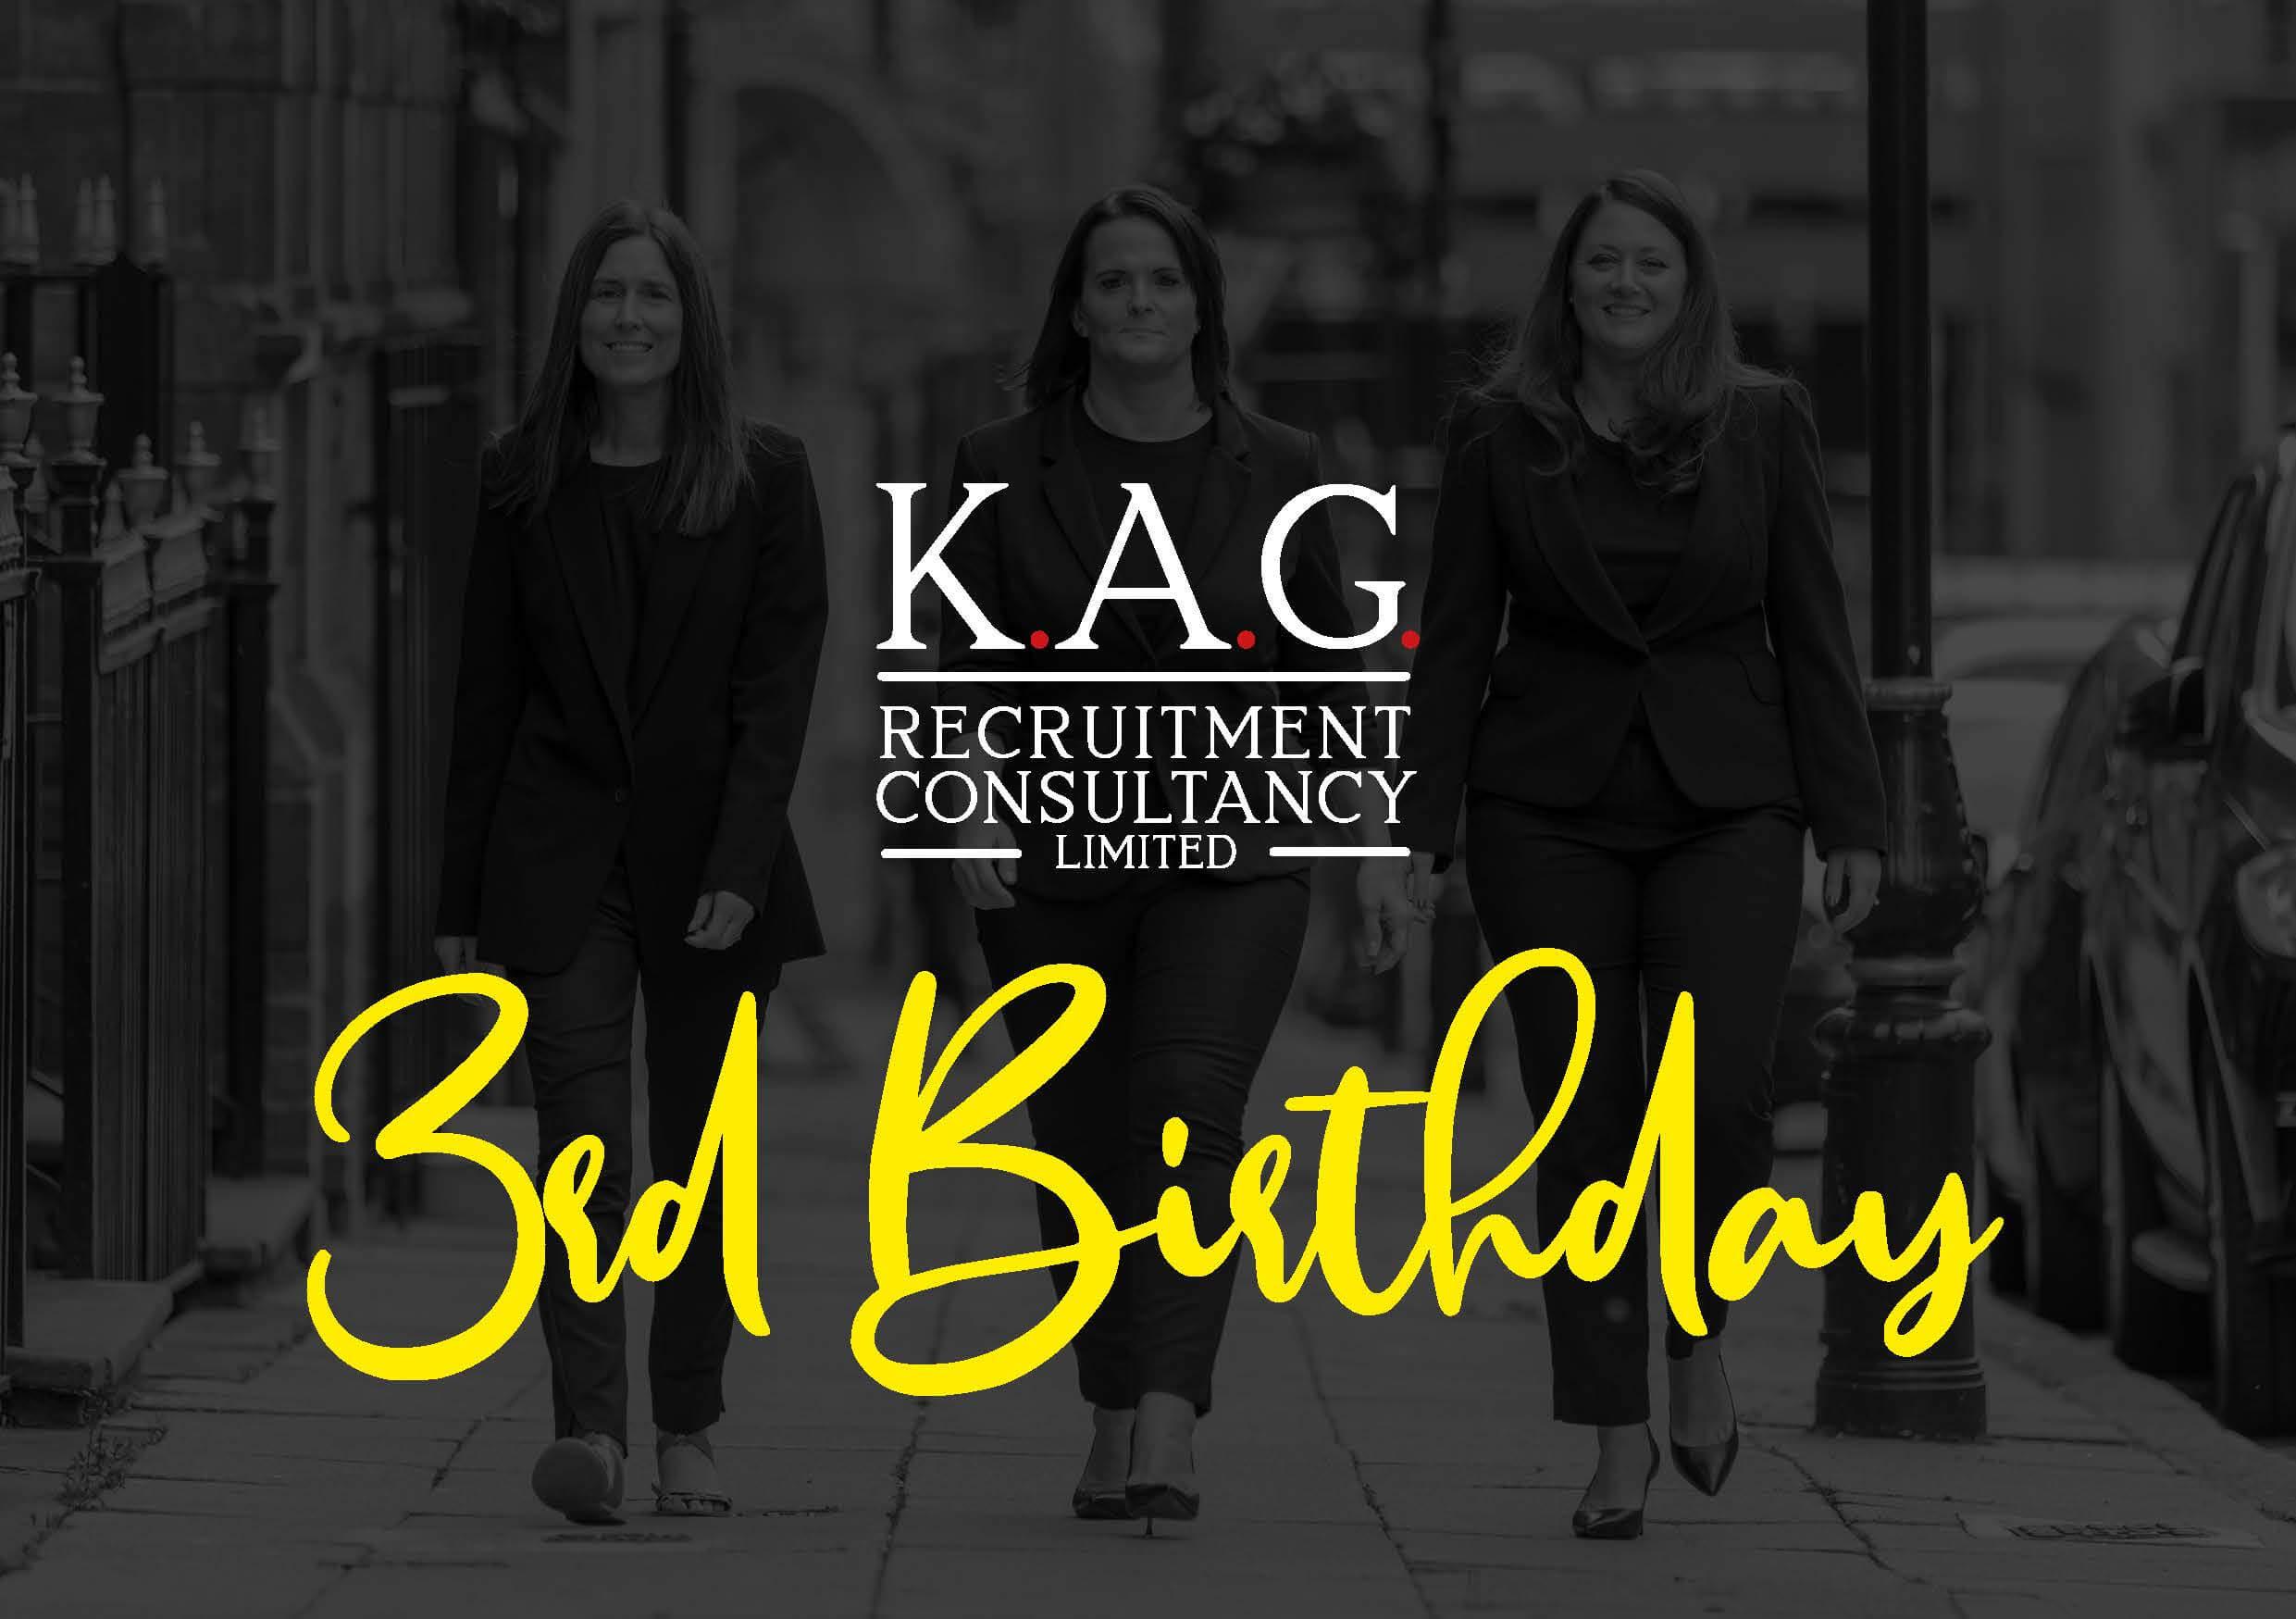 Best friend Award - KAG Recruitment Consultancy